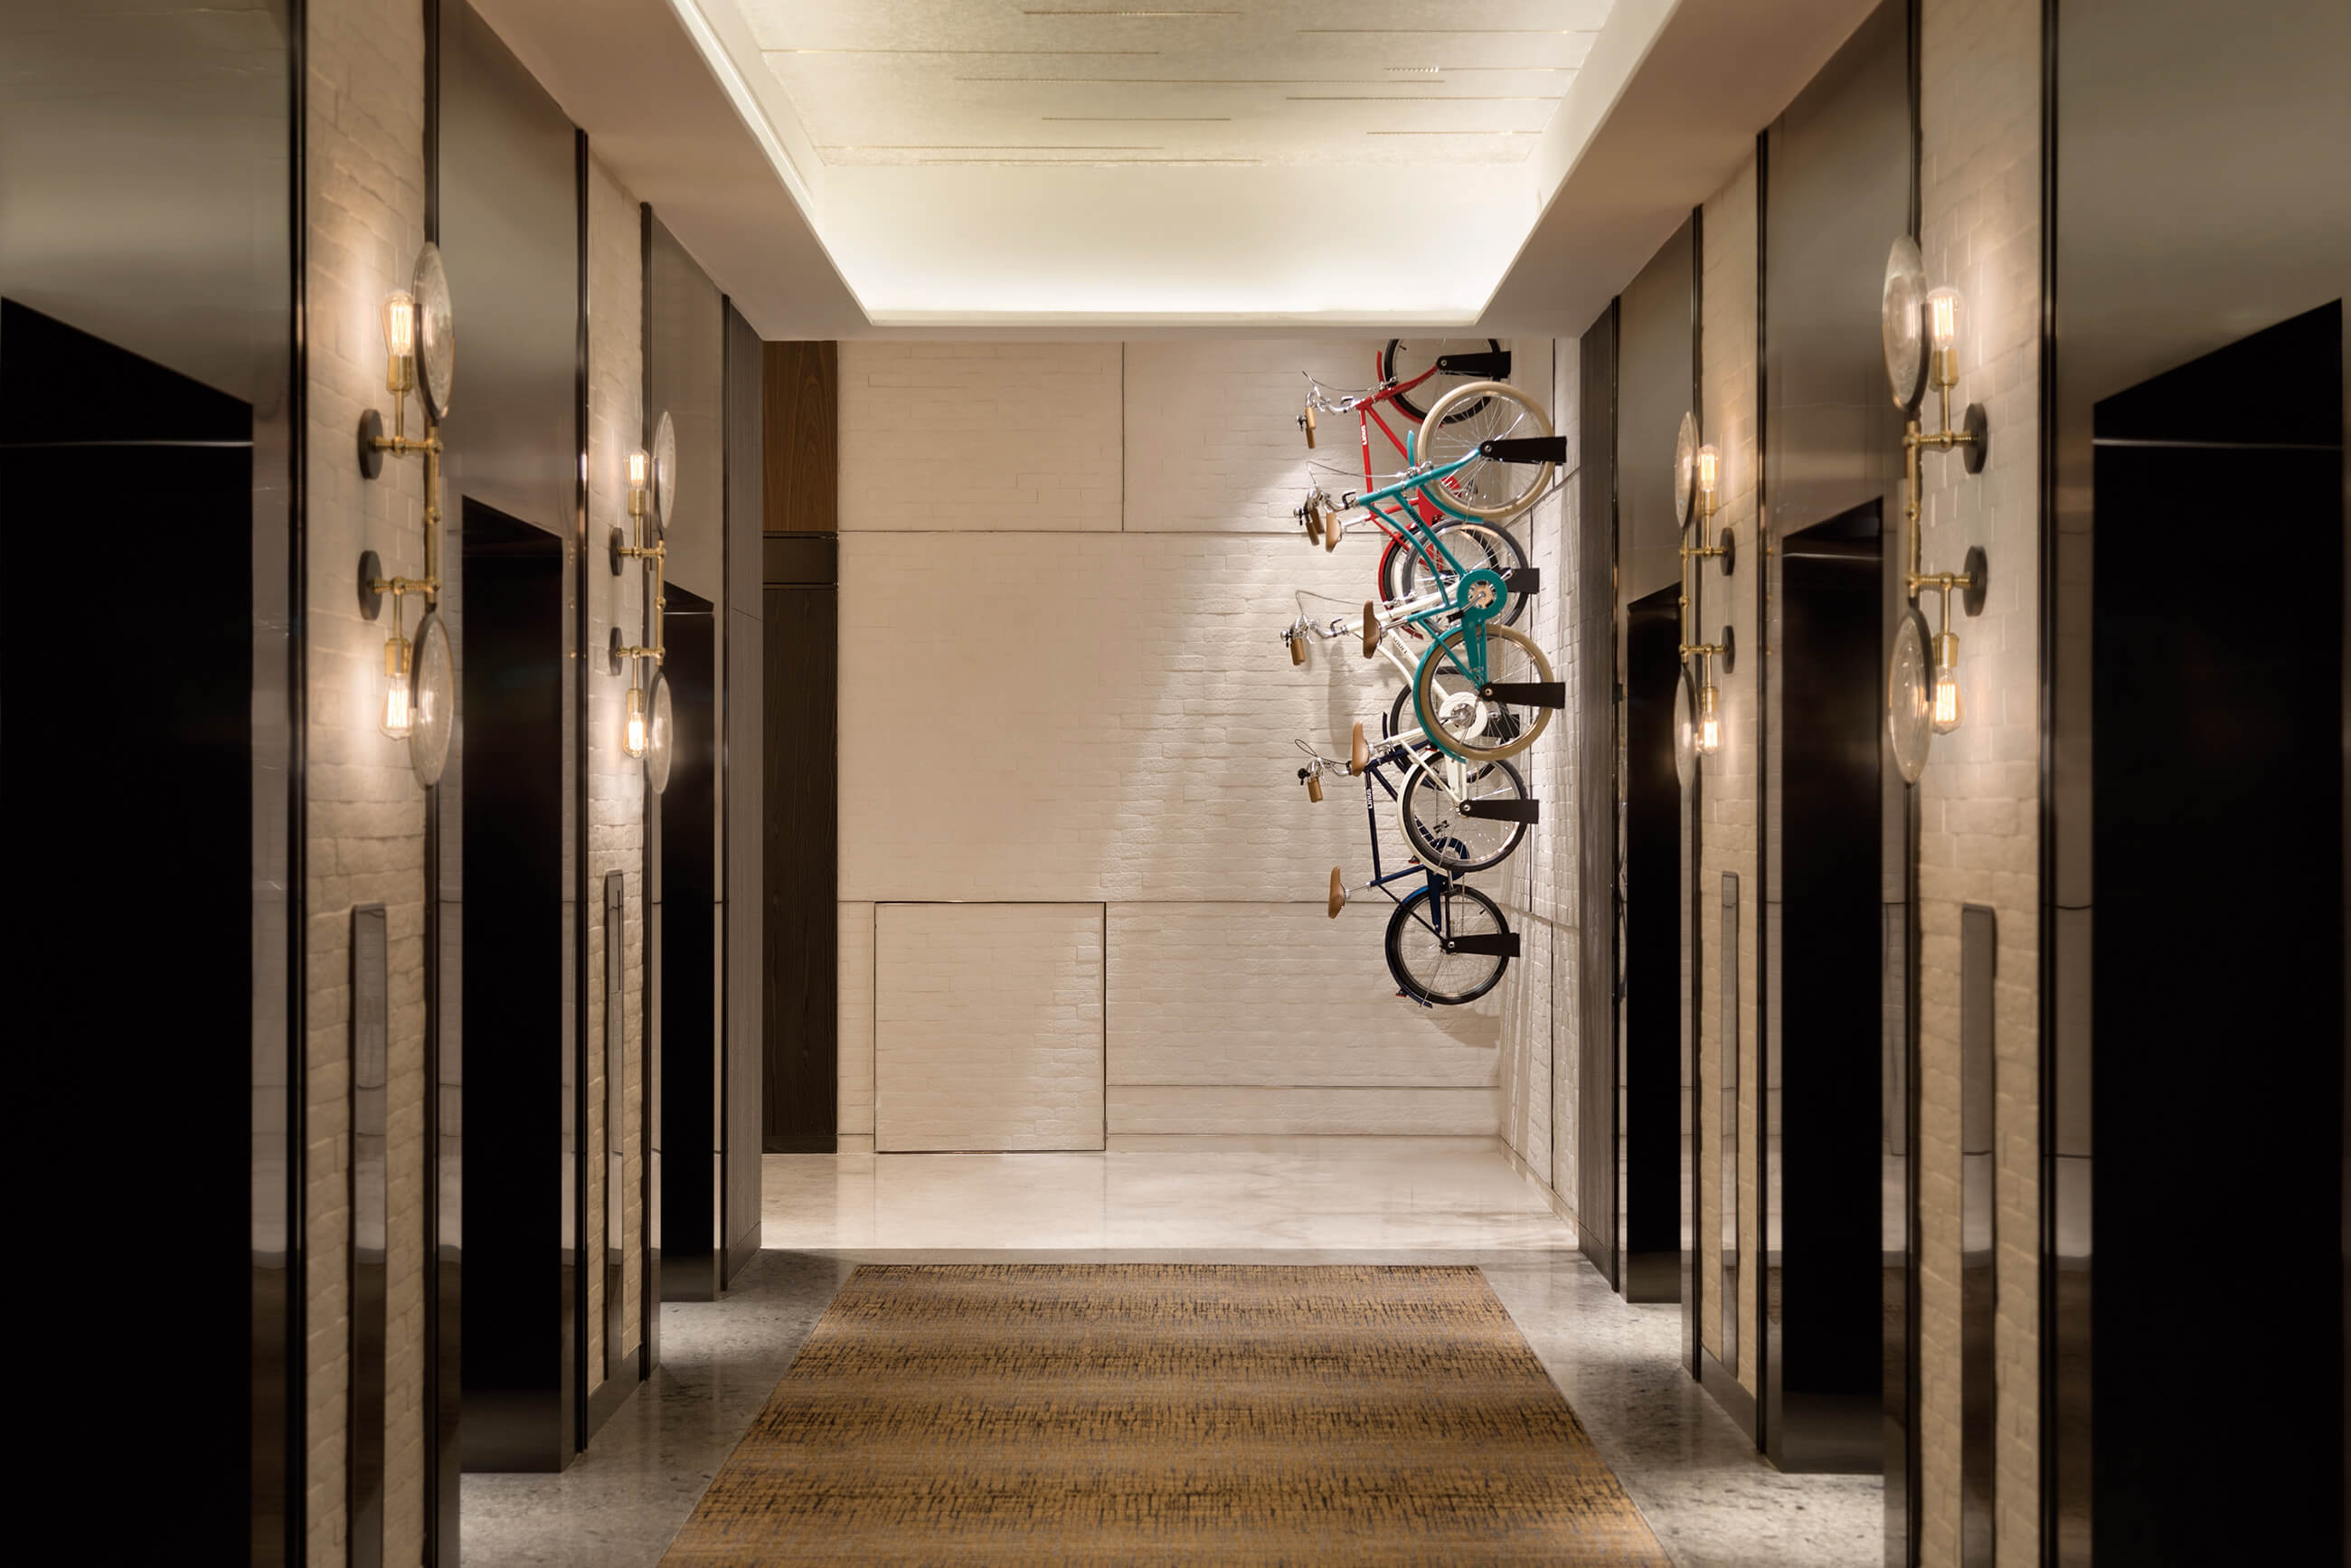 https://bubo.sk/uploads/galleries/5061/jen_tanglin_hotel_izby.jpg